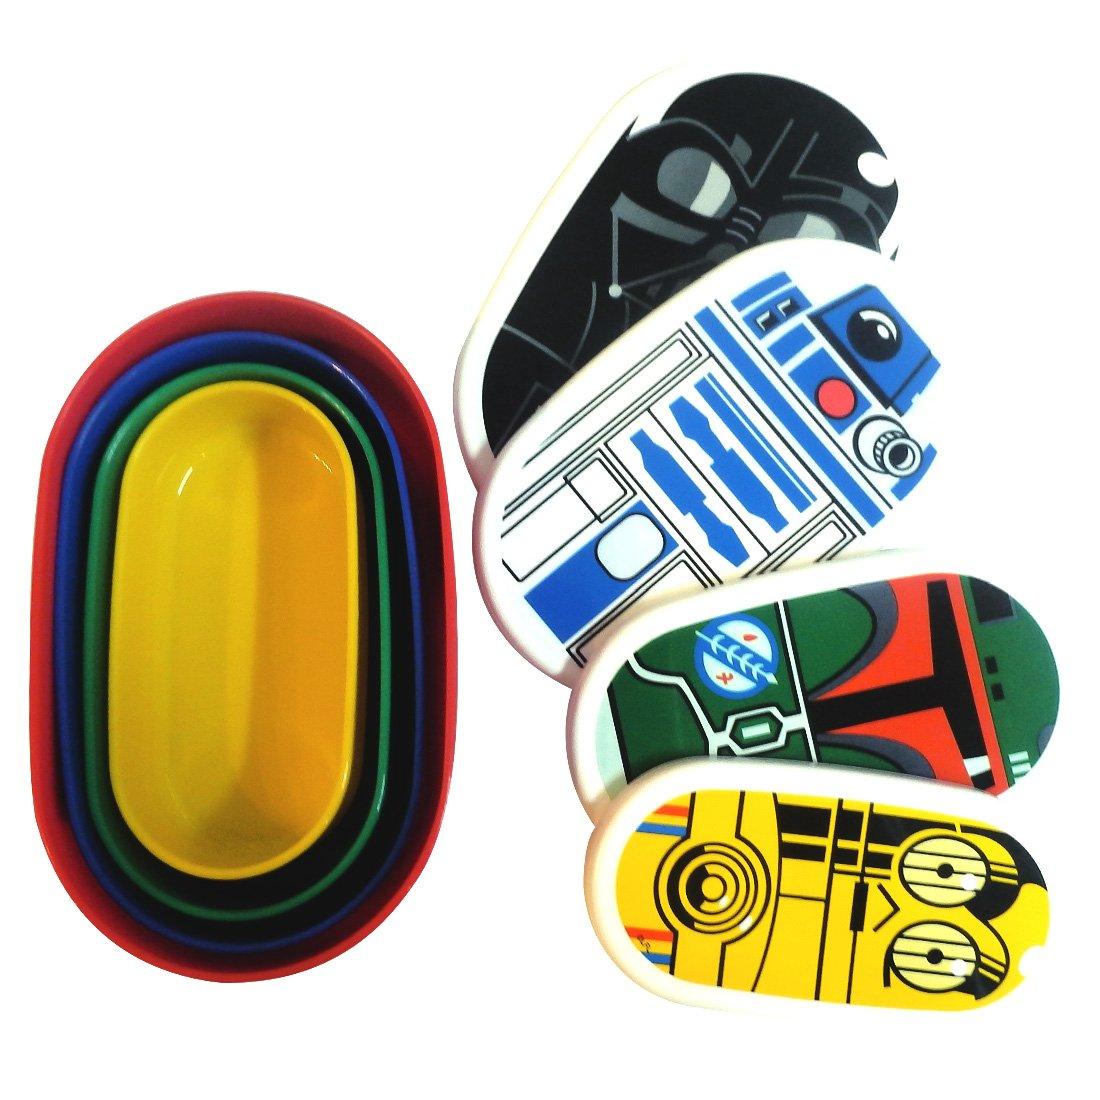 d82d1d6cd404 Amazon.com: Star Wars 4-Piece Nesting Food Storage Boxes ...